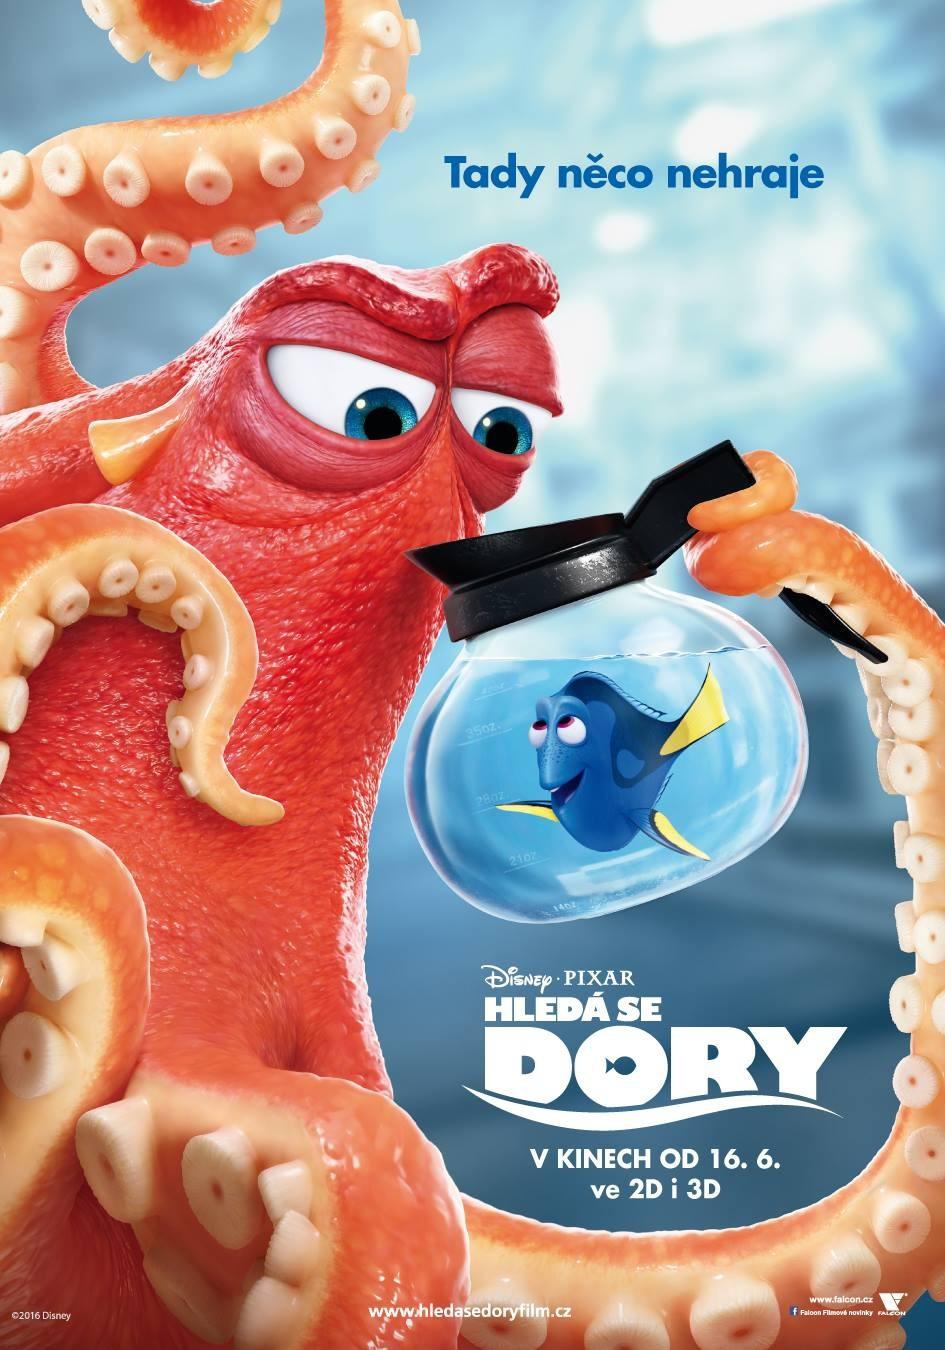 'Buscando a Dory', carteles